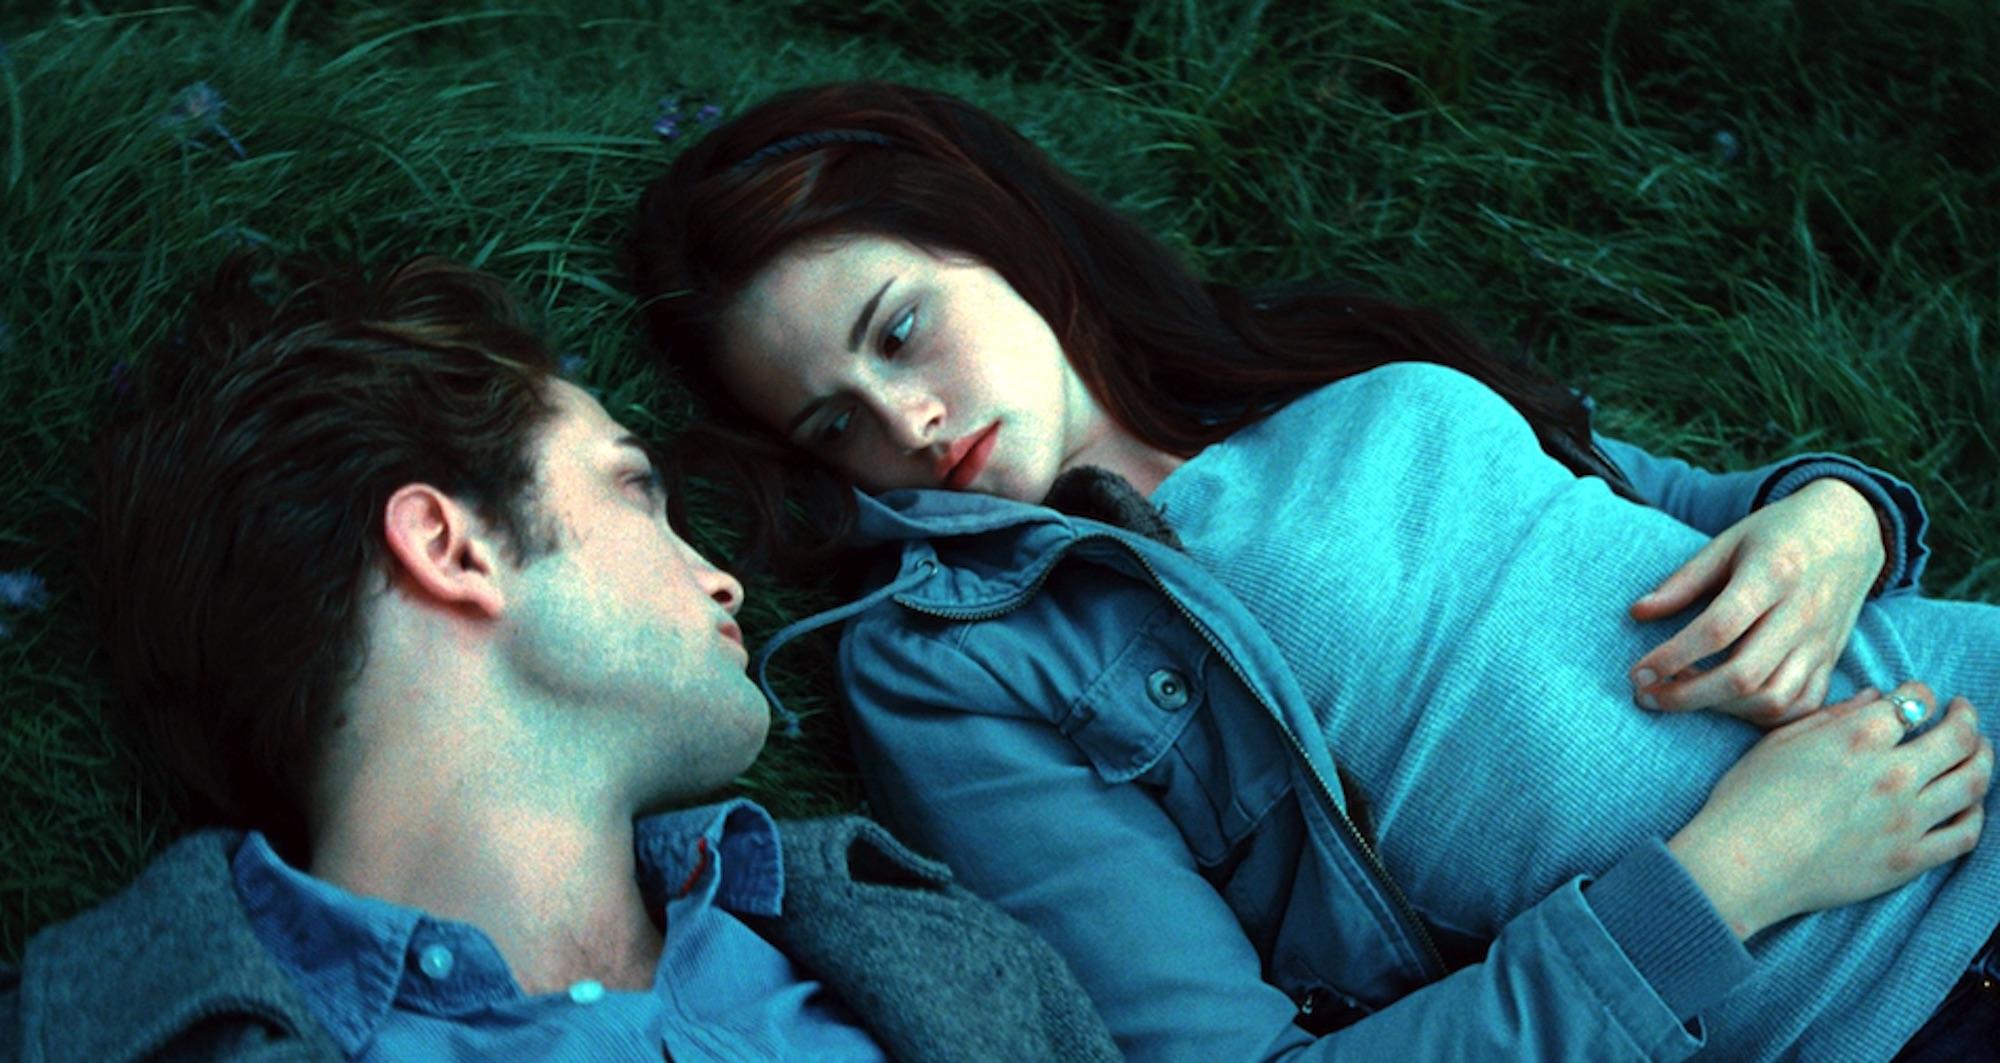 Edward Cullen (Robert Pattinson) and Bella Swan (Kristen Stewart) in his meadow, 'Twilight'